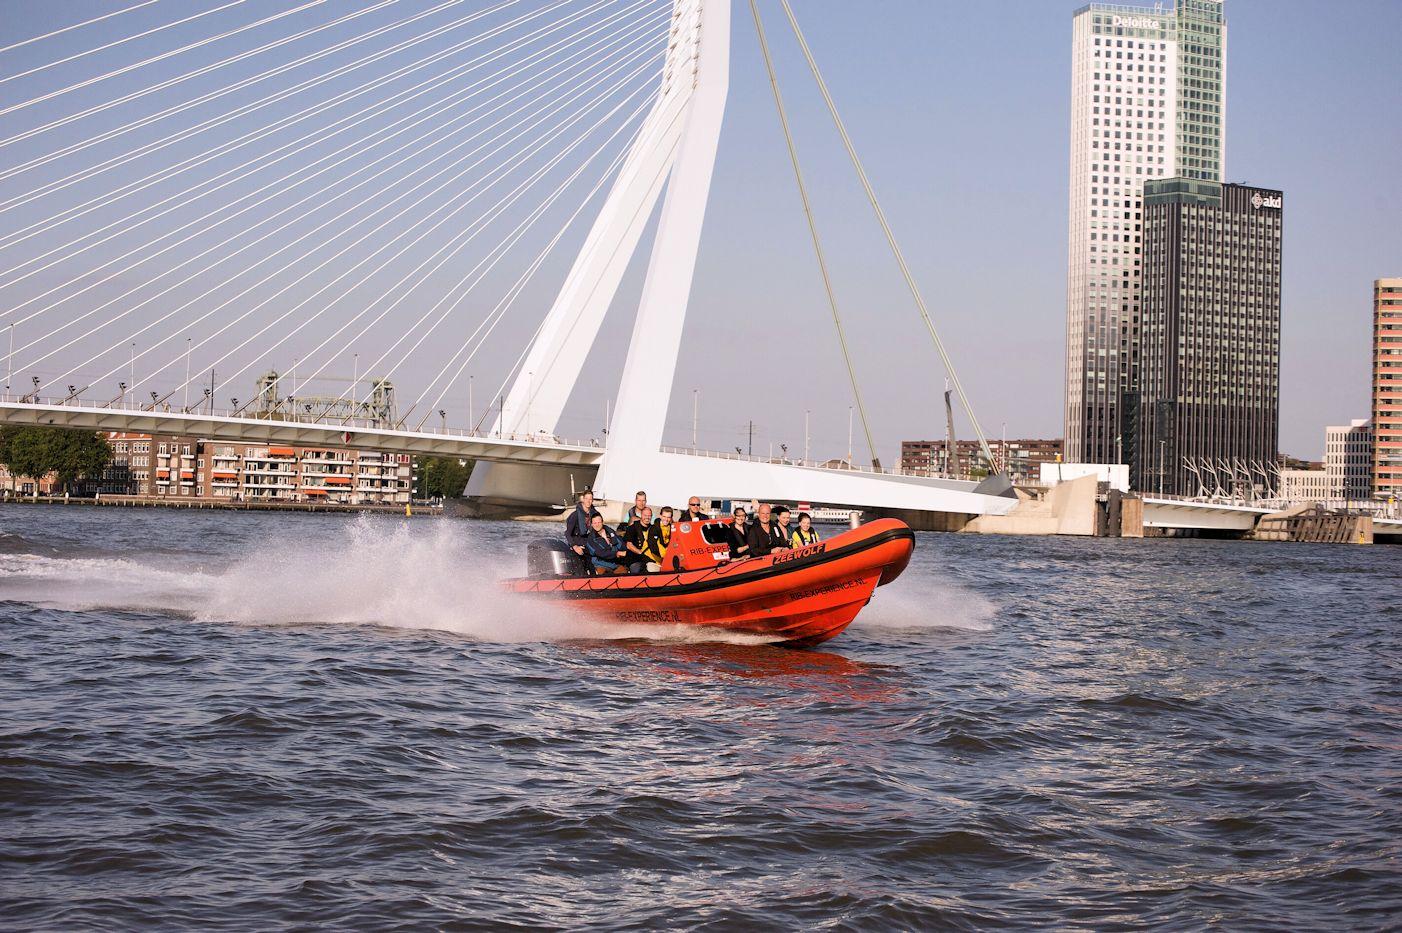 RIB boat-experience over de Maas!